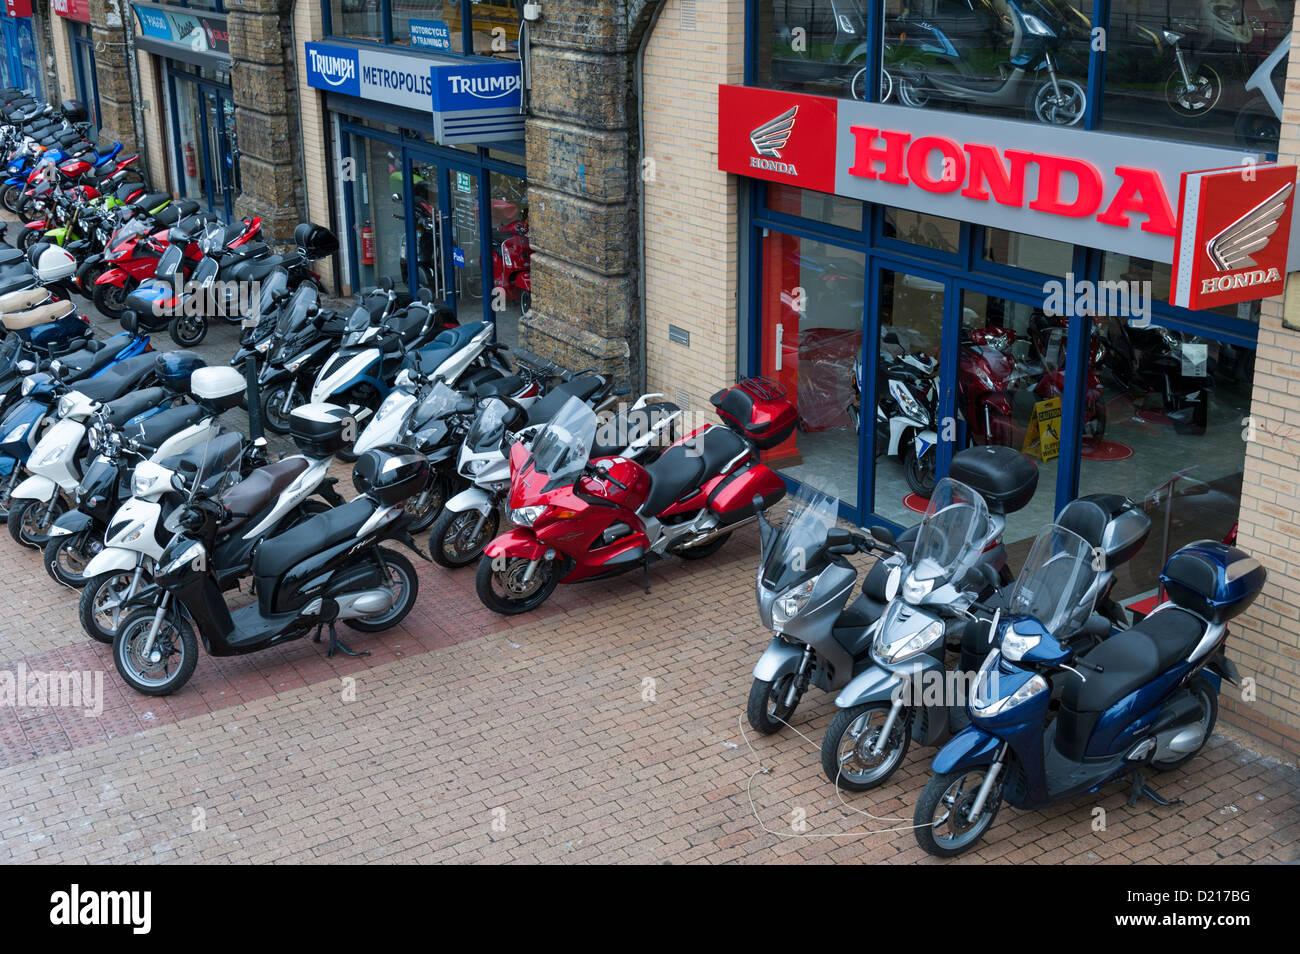 Honda Motorcycle Dealer Bangkok